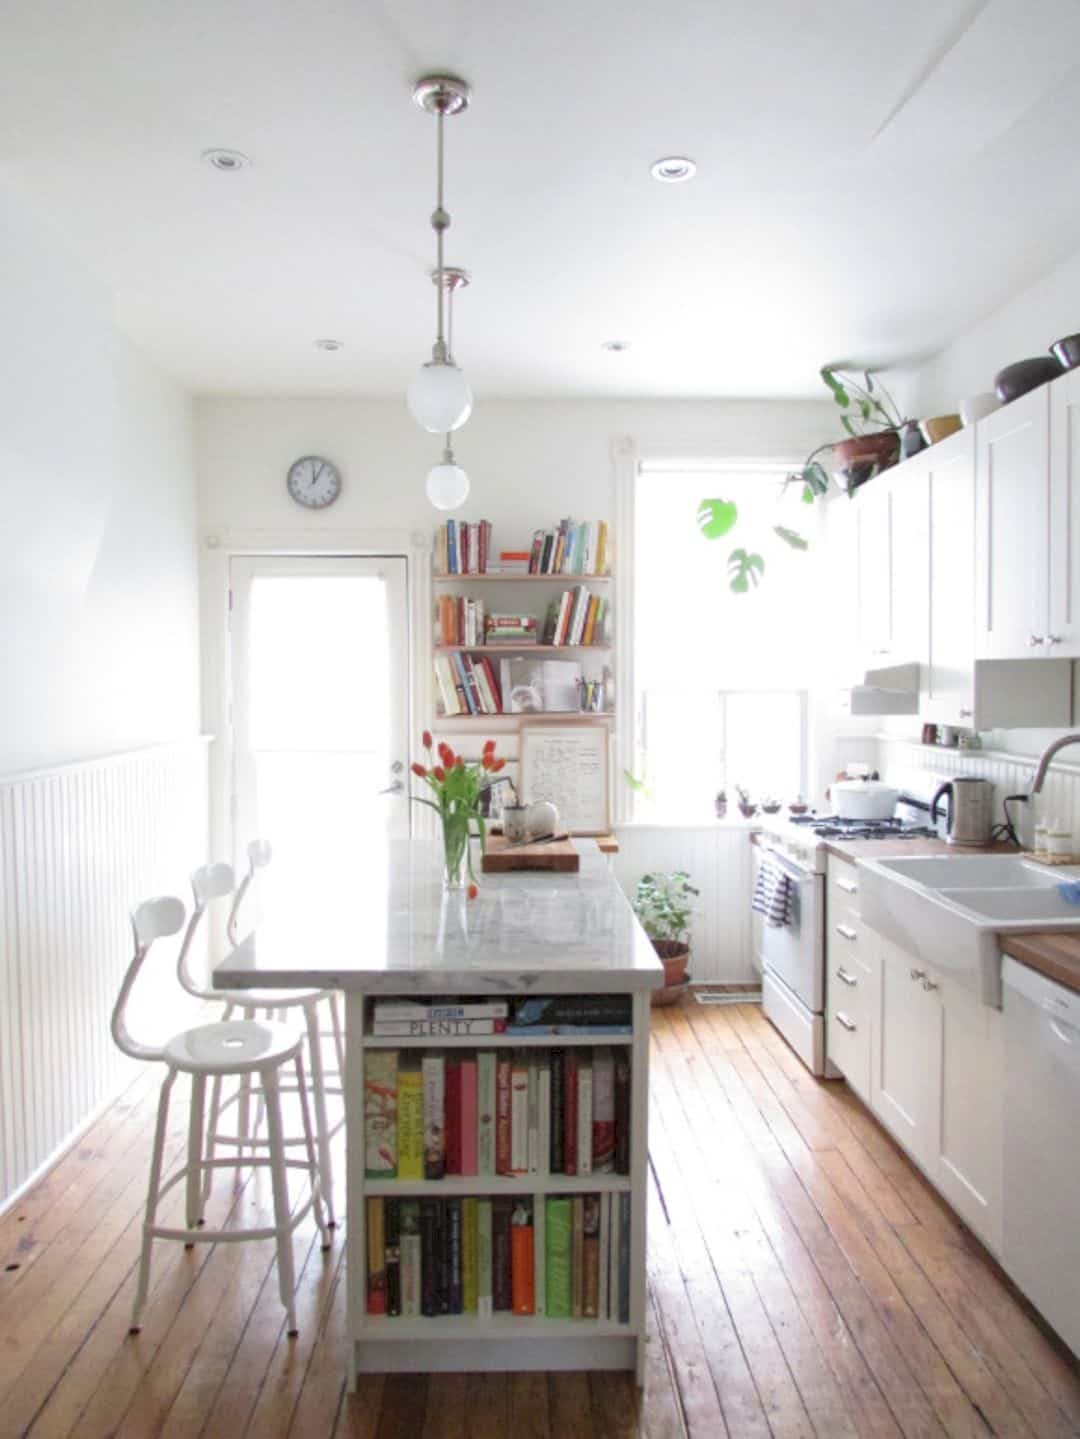 8 Impactful Small Kitchen Island Ideas To Brighten Your Home